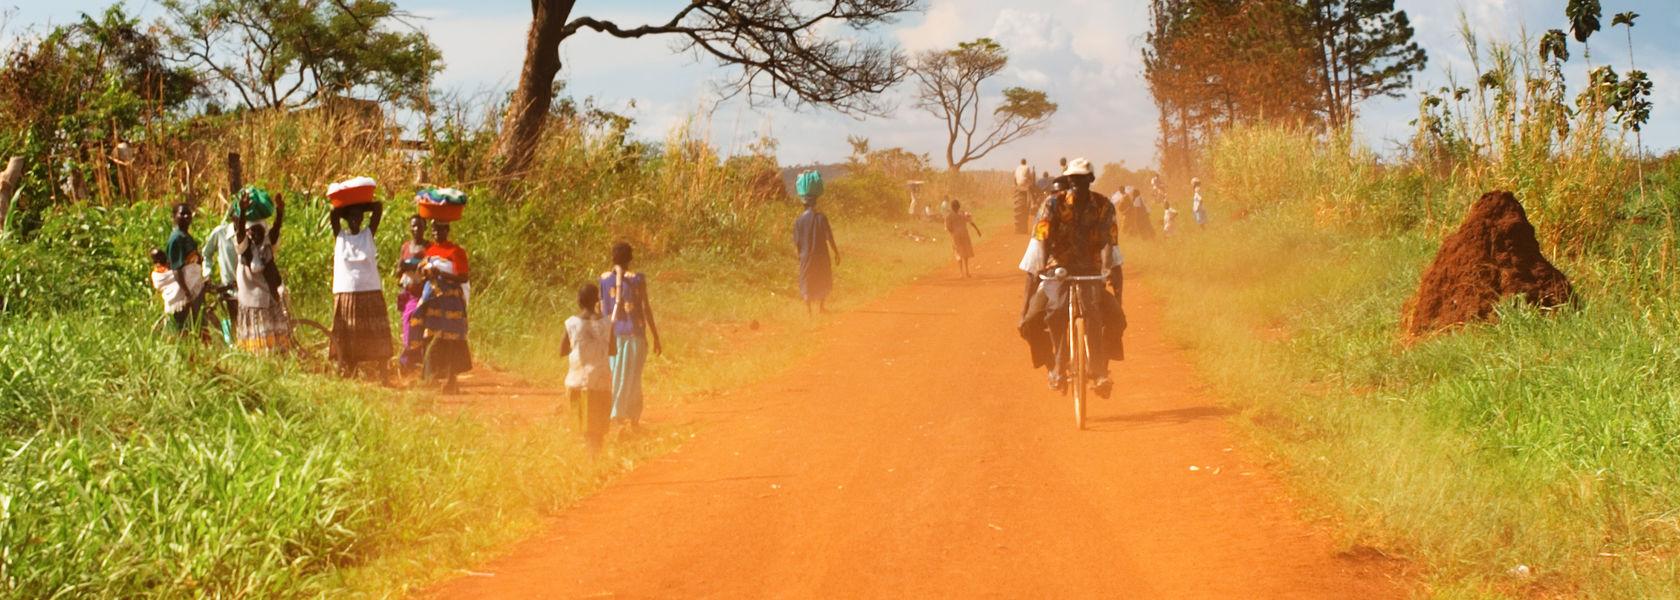 Duurzaam reizen tips - Hoe maak ik mijn reis duurzamer - Matoke Tours